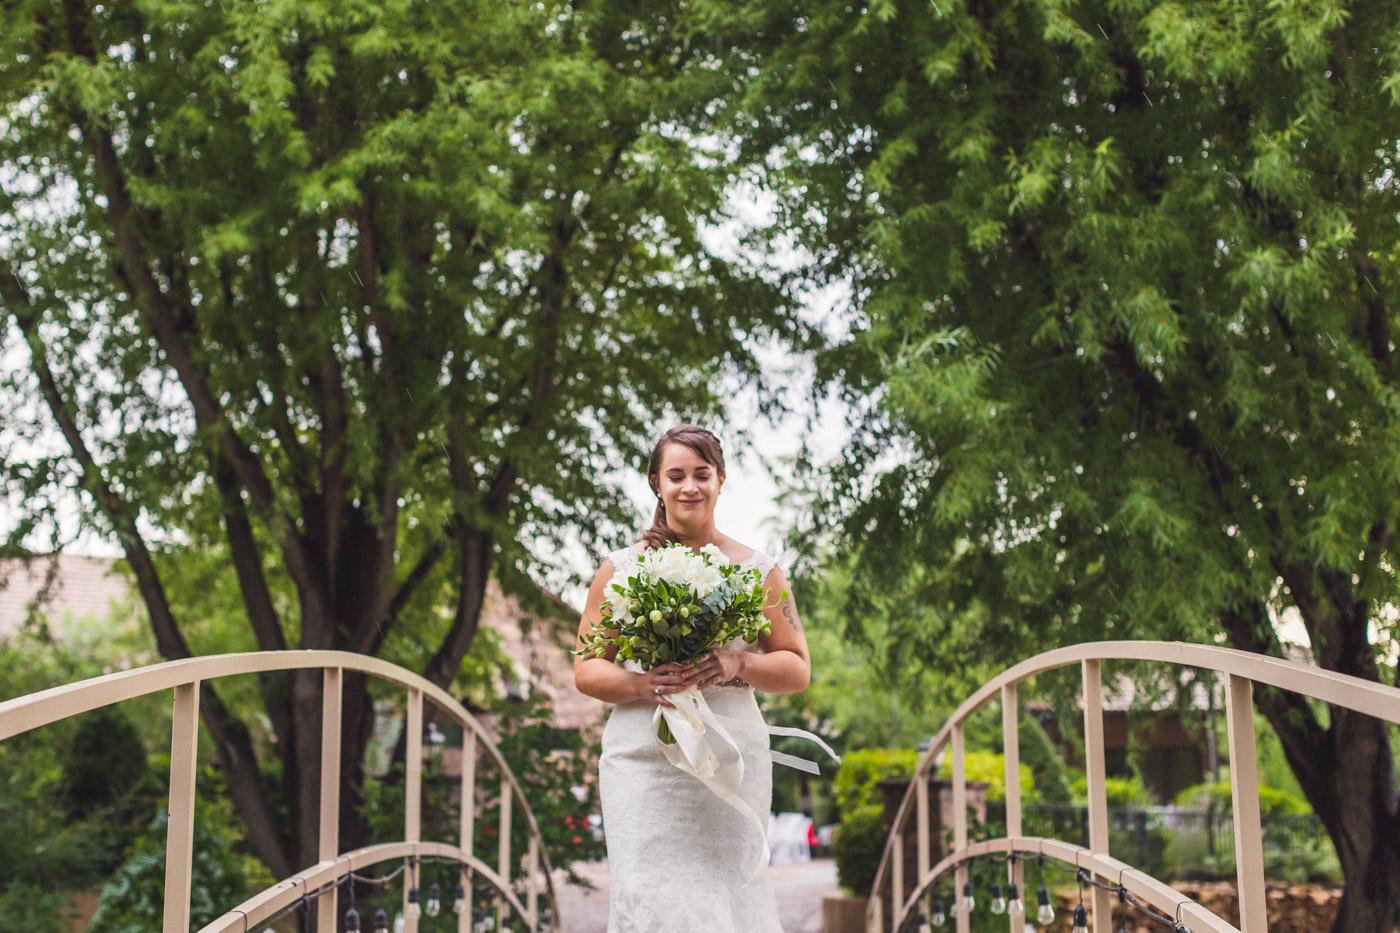 az-bride-walks-to-wedding-ceremony